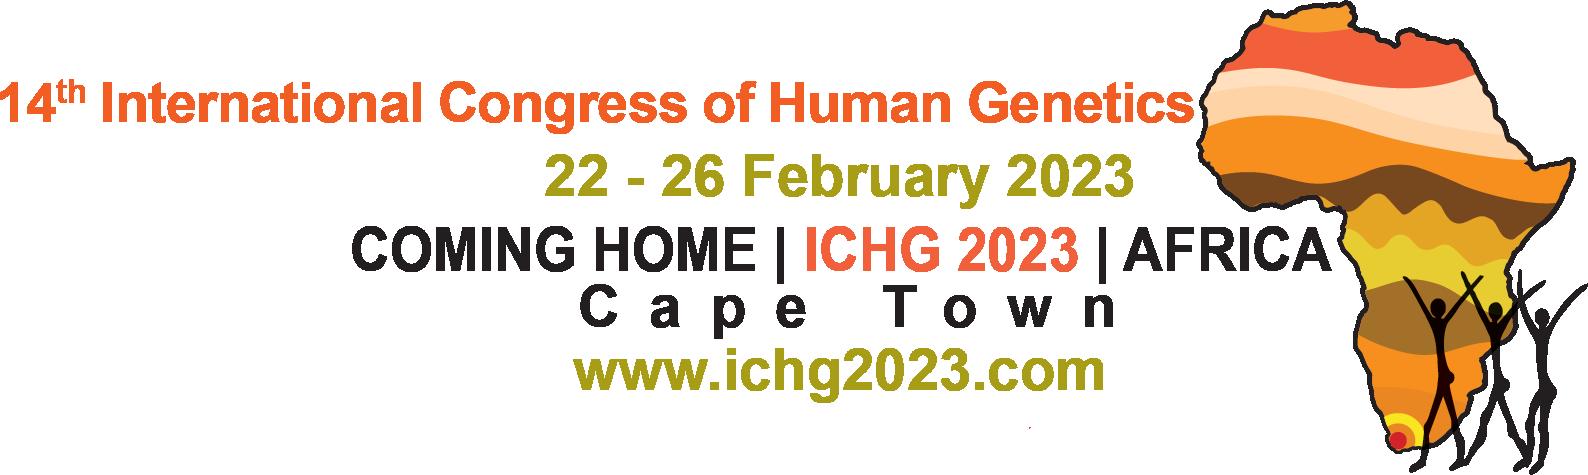 International Congress of Human Genetics 2022